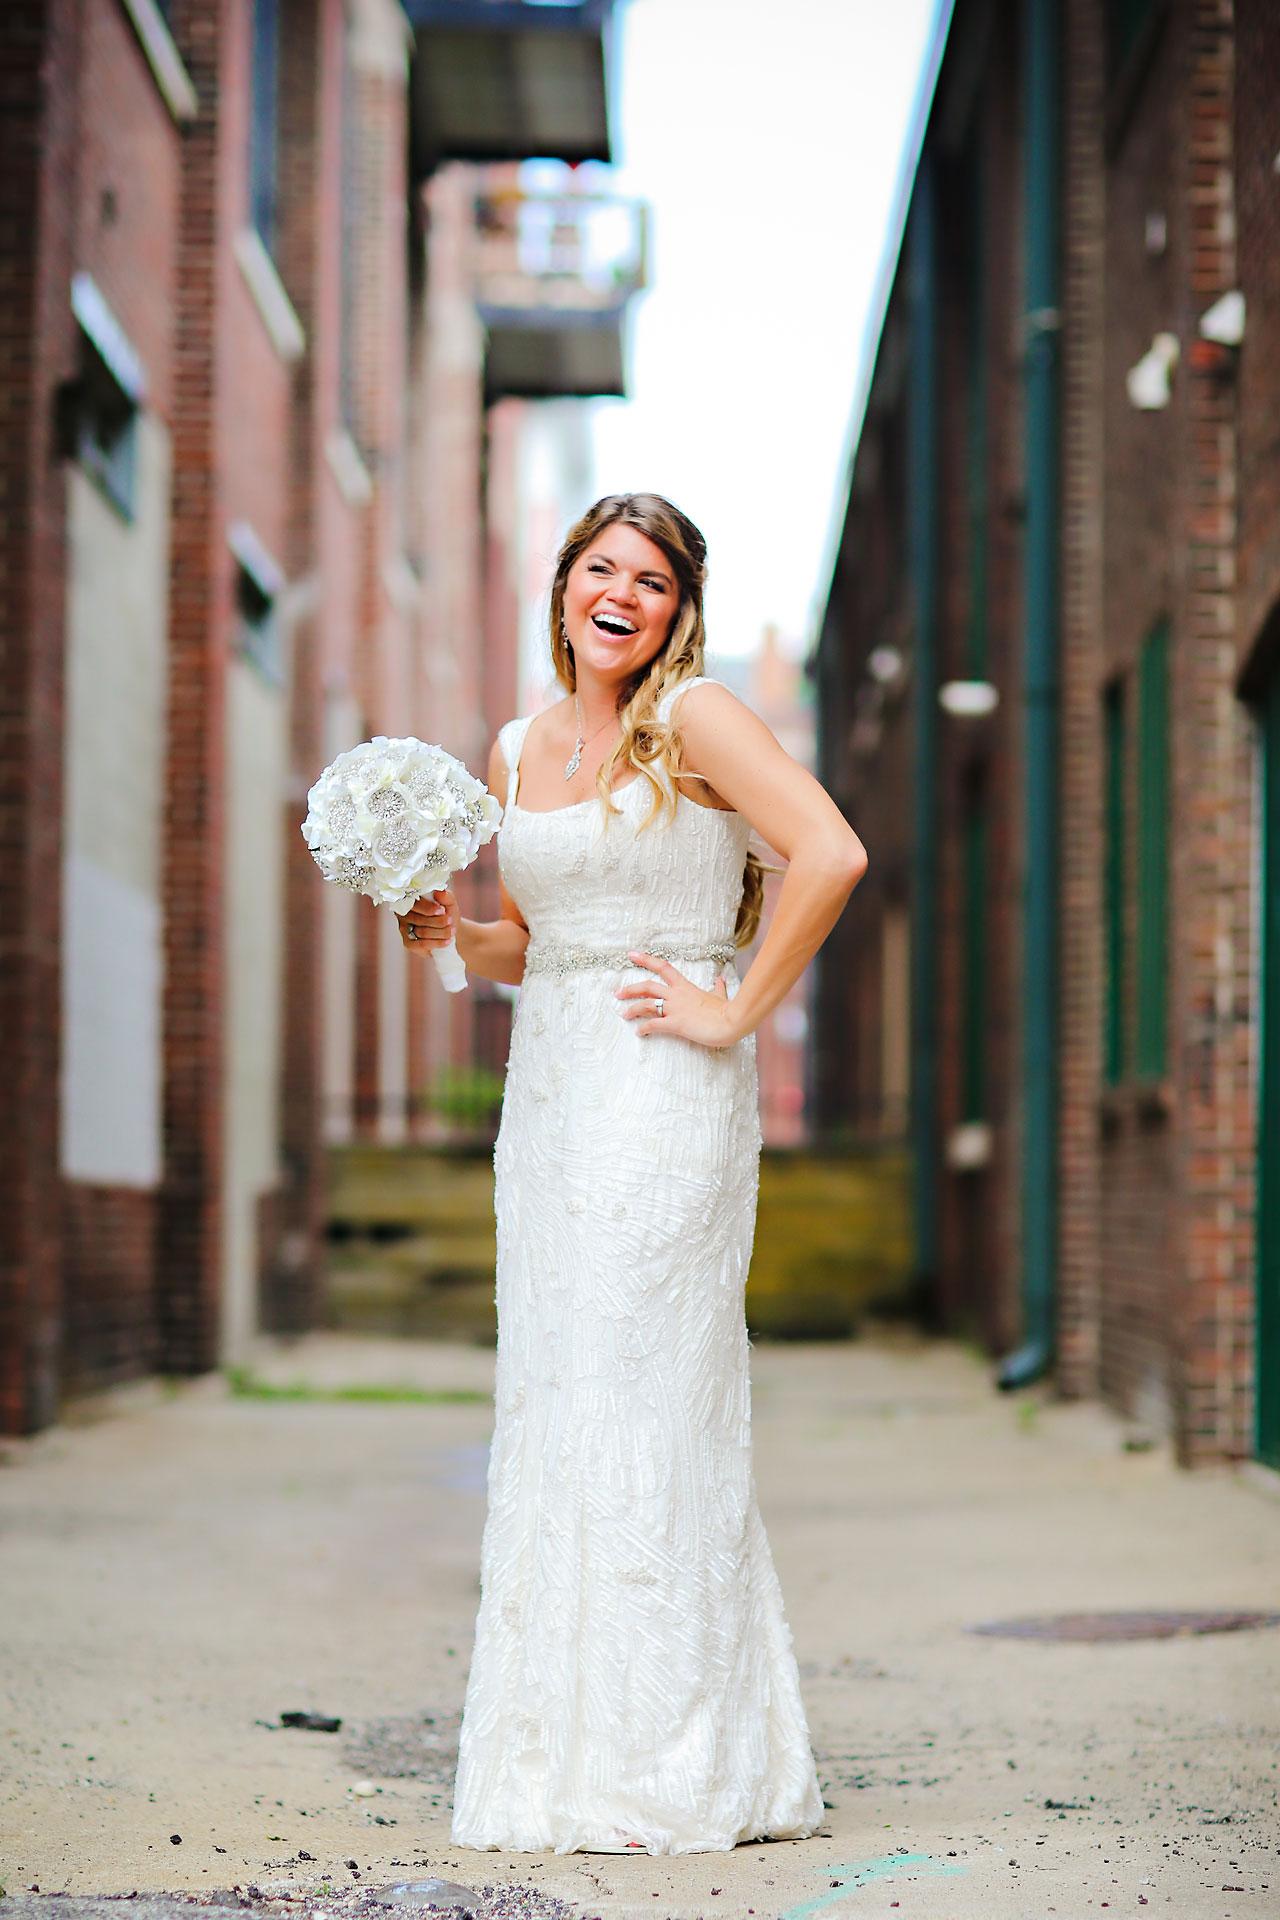 Amy Nick Canal 337 Wedding 122